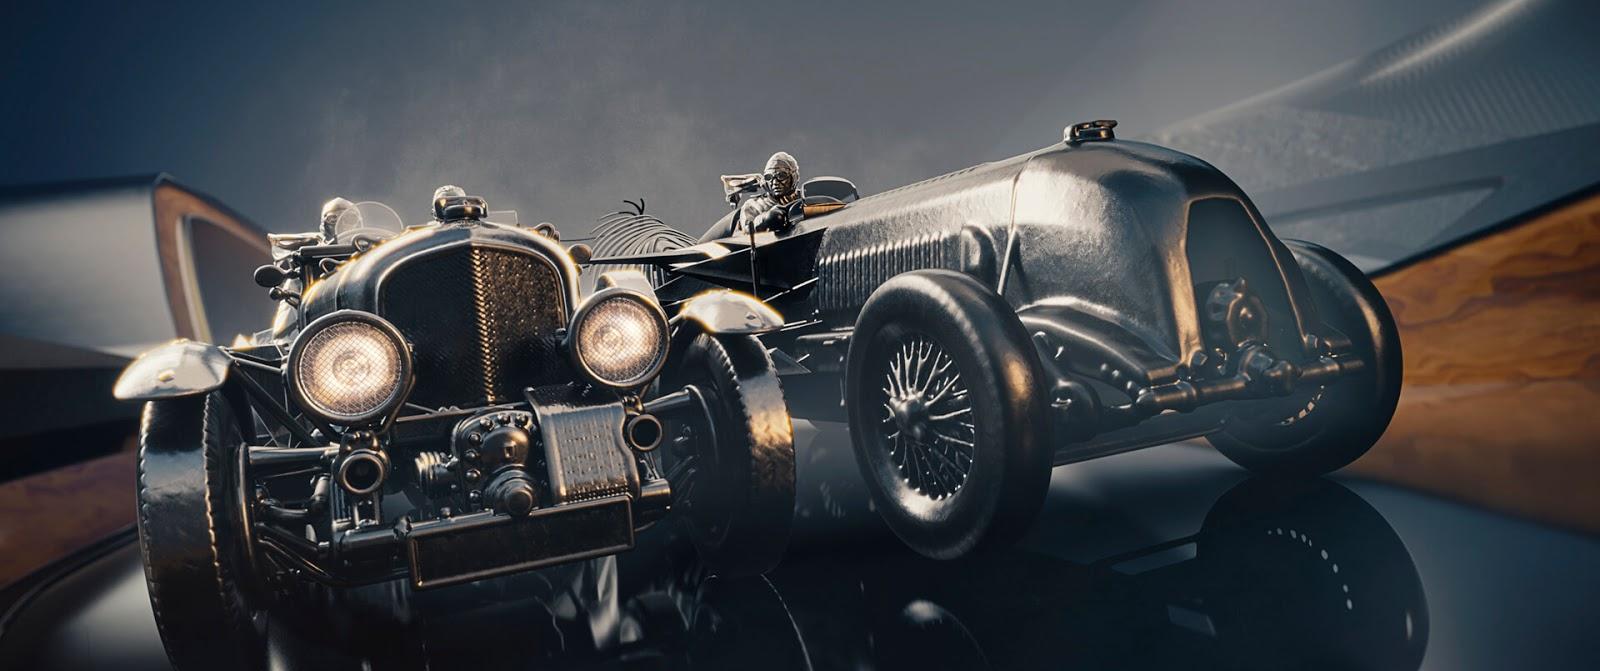 bentley1 11 σταθμοί στην 100χρονη πορεία της Bentley